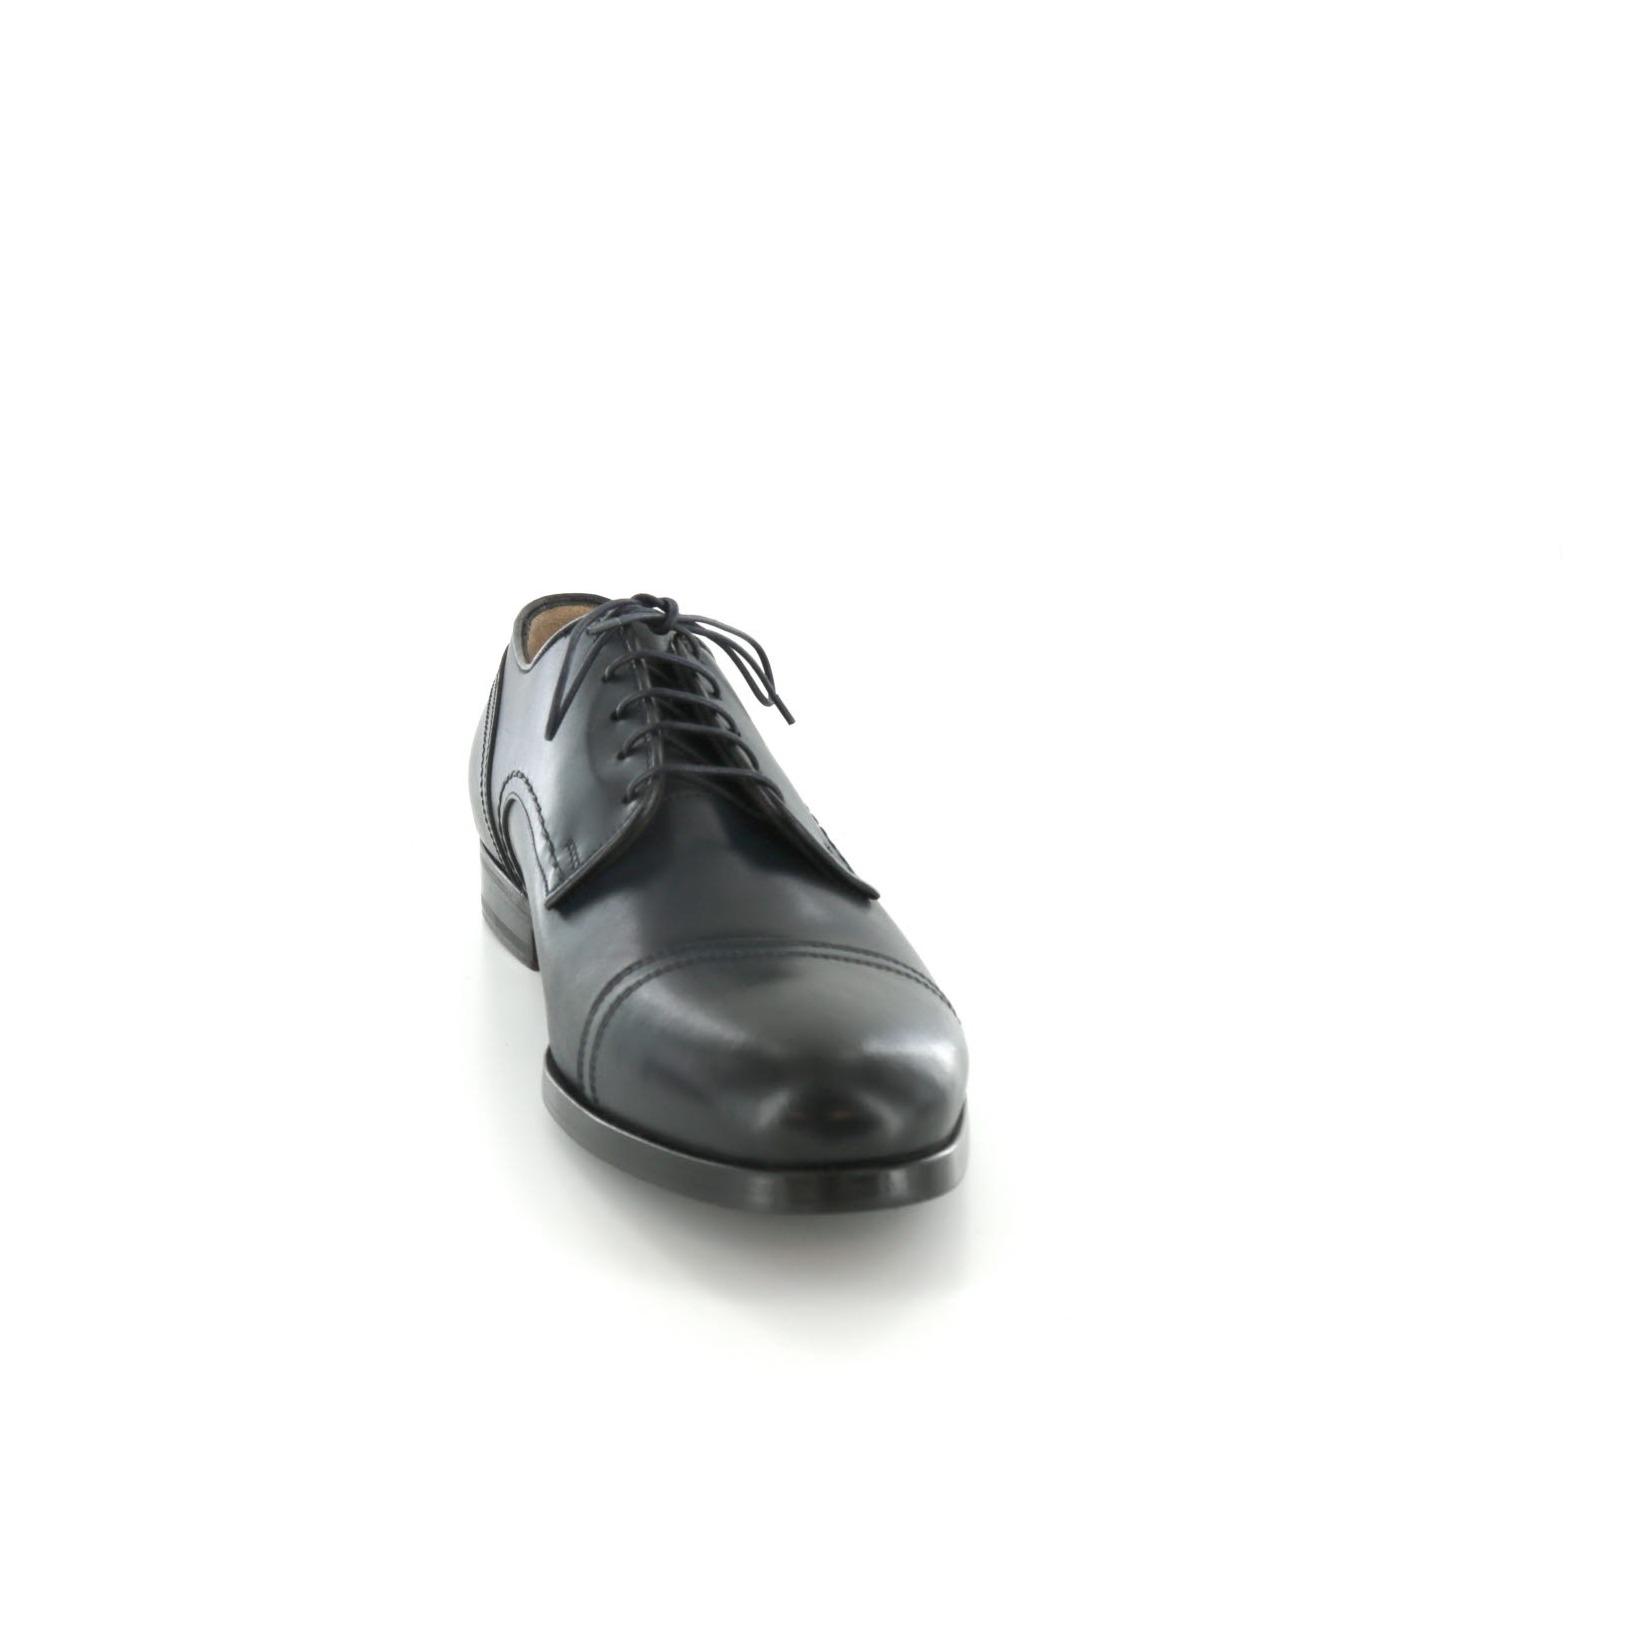 Santoni / Pizzo Scarpe - Scarpe Da Ginnastica, Blu